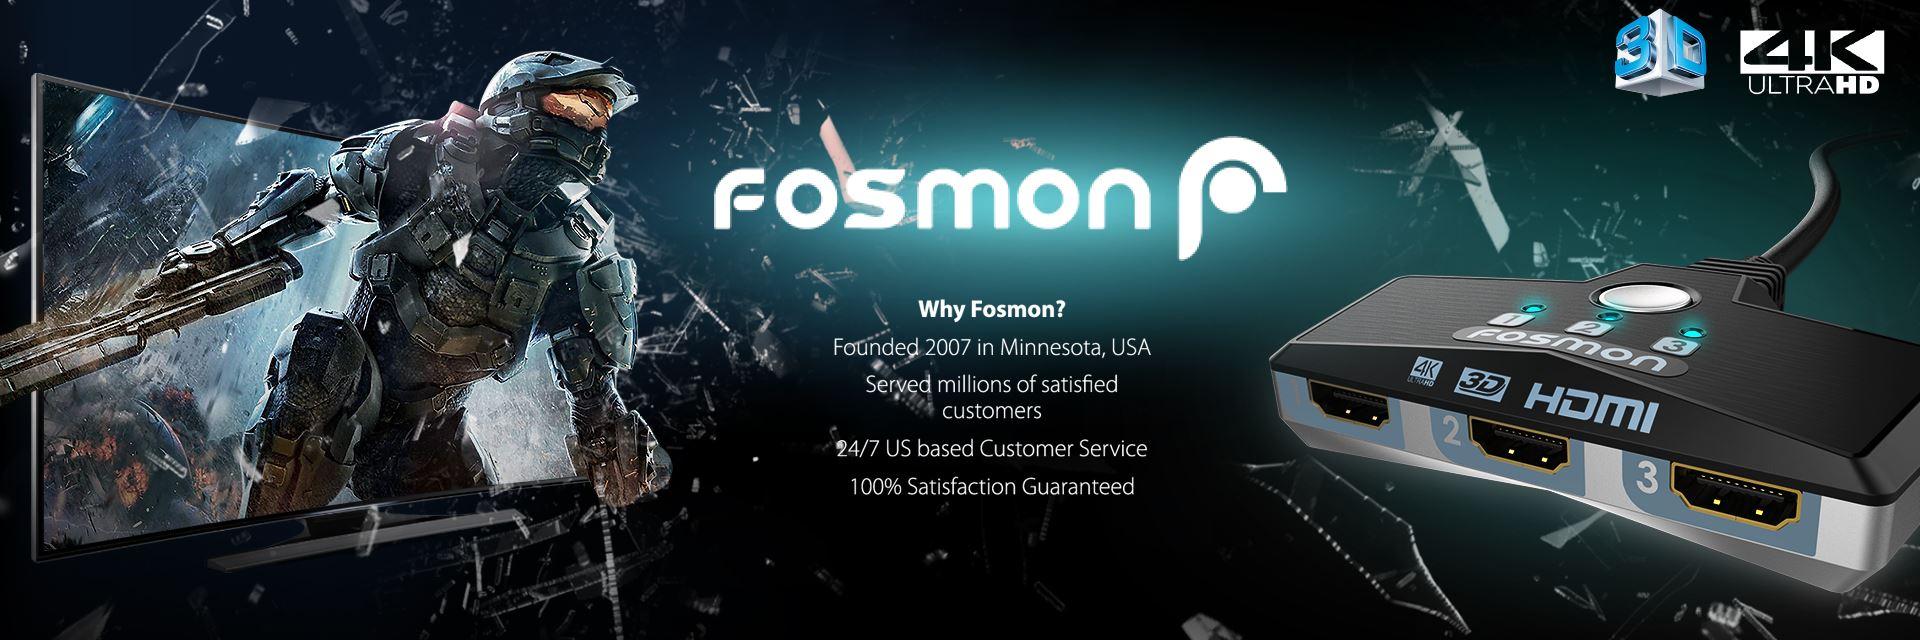 Fosmon